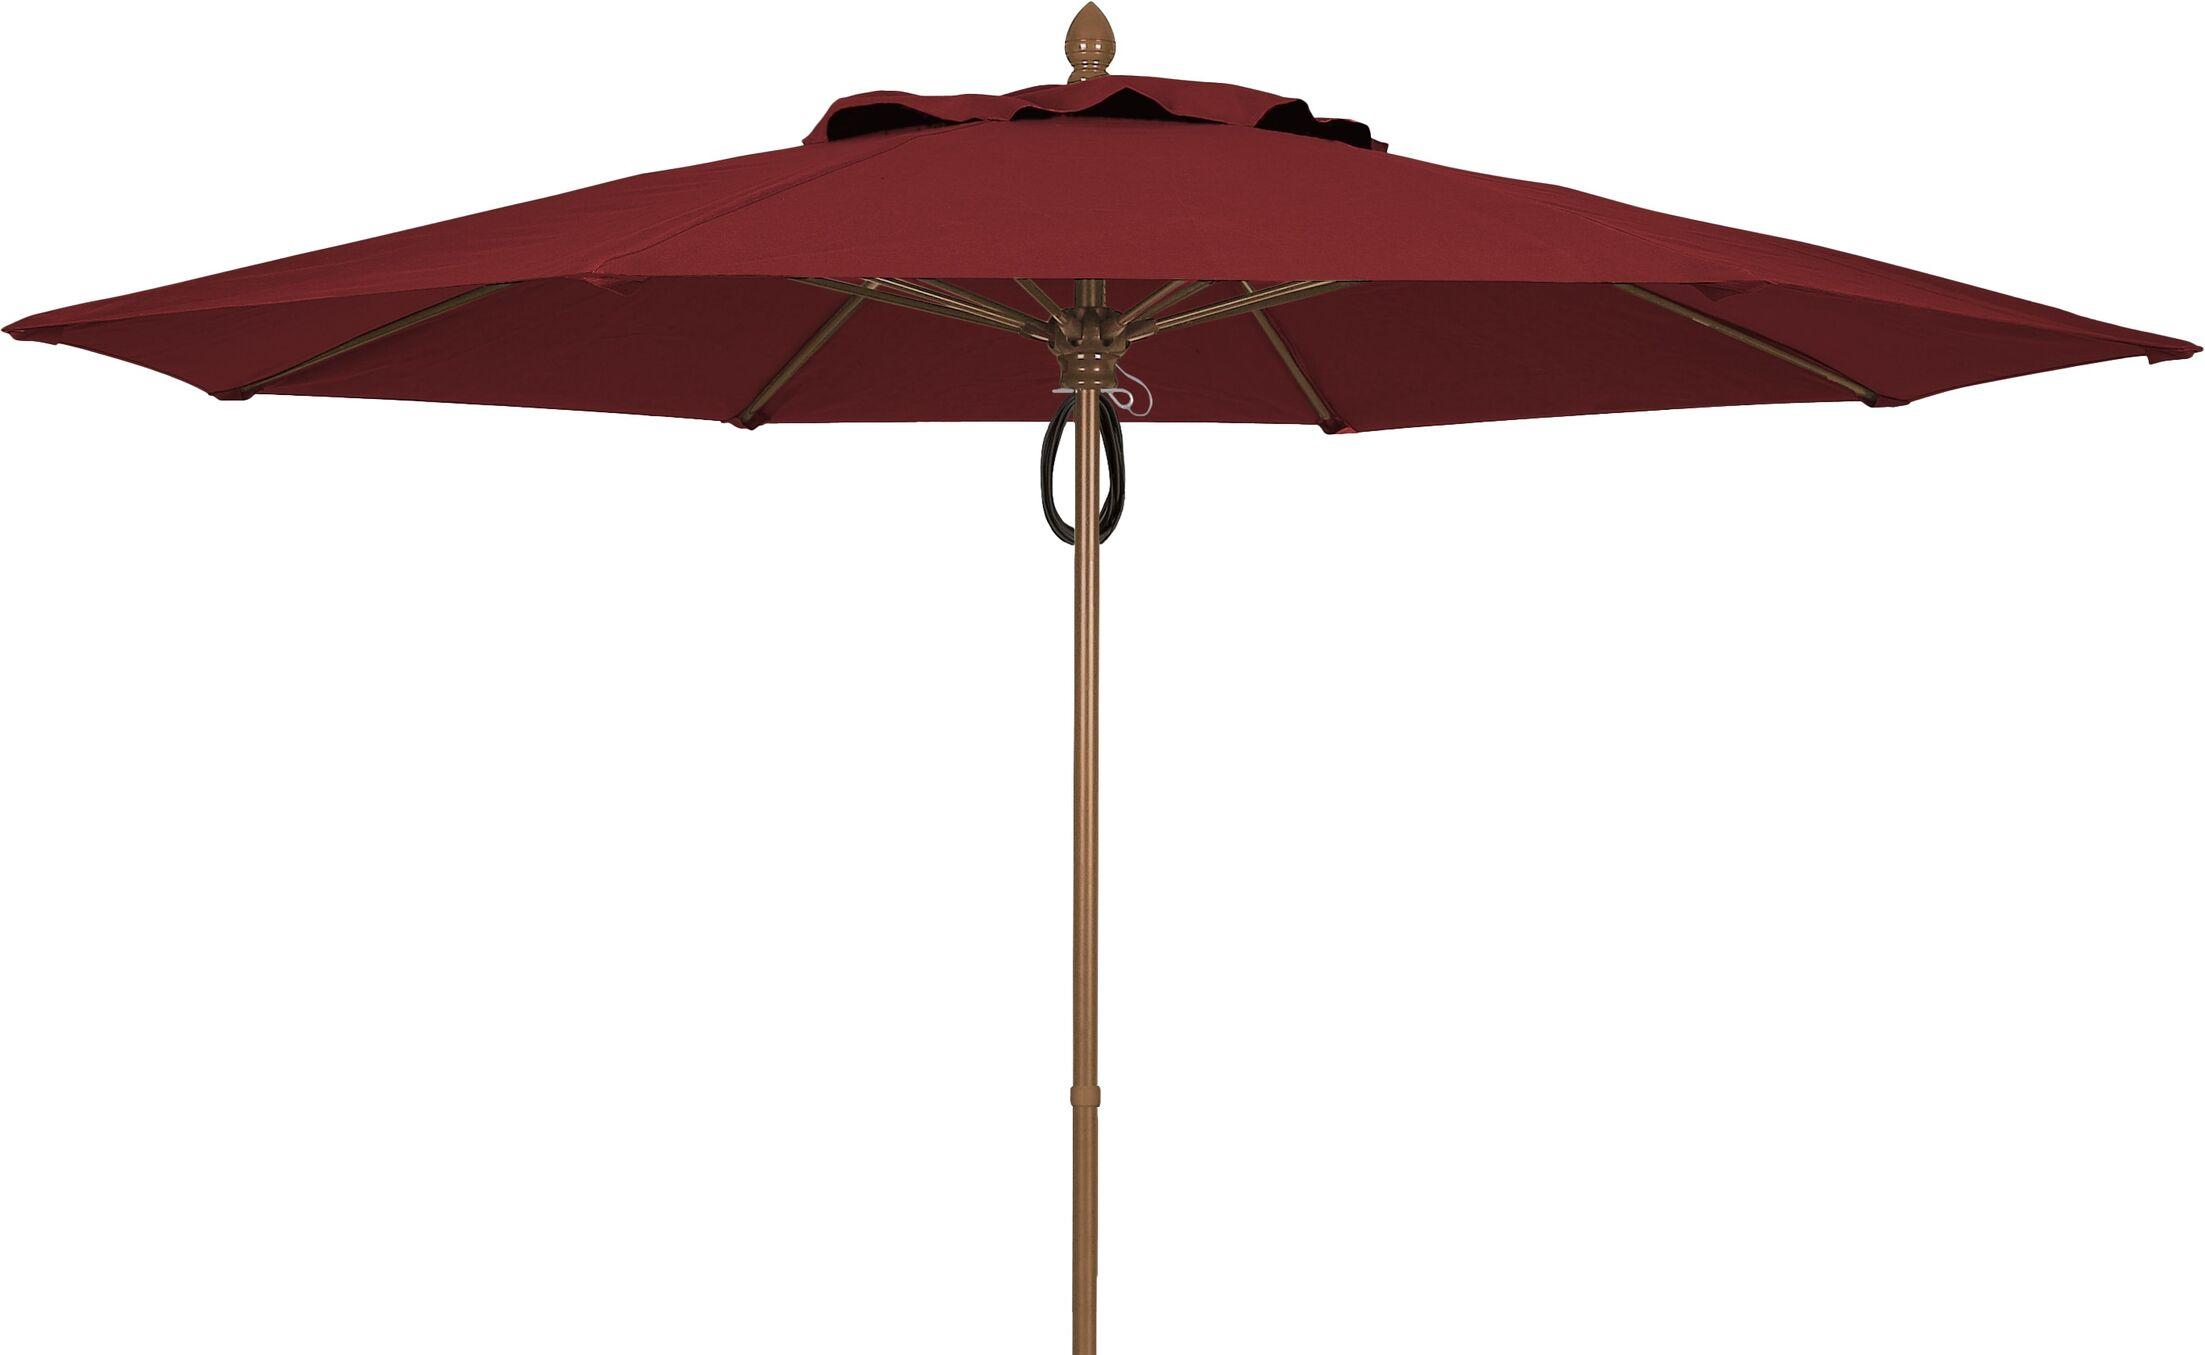 Prestige 11' Market Umbrella Frame Finish: White, Fabric: Burgundy